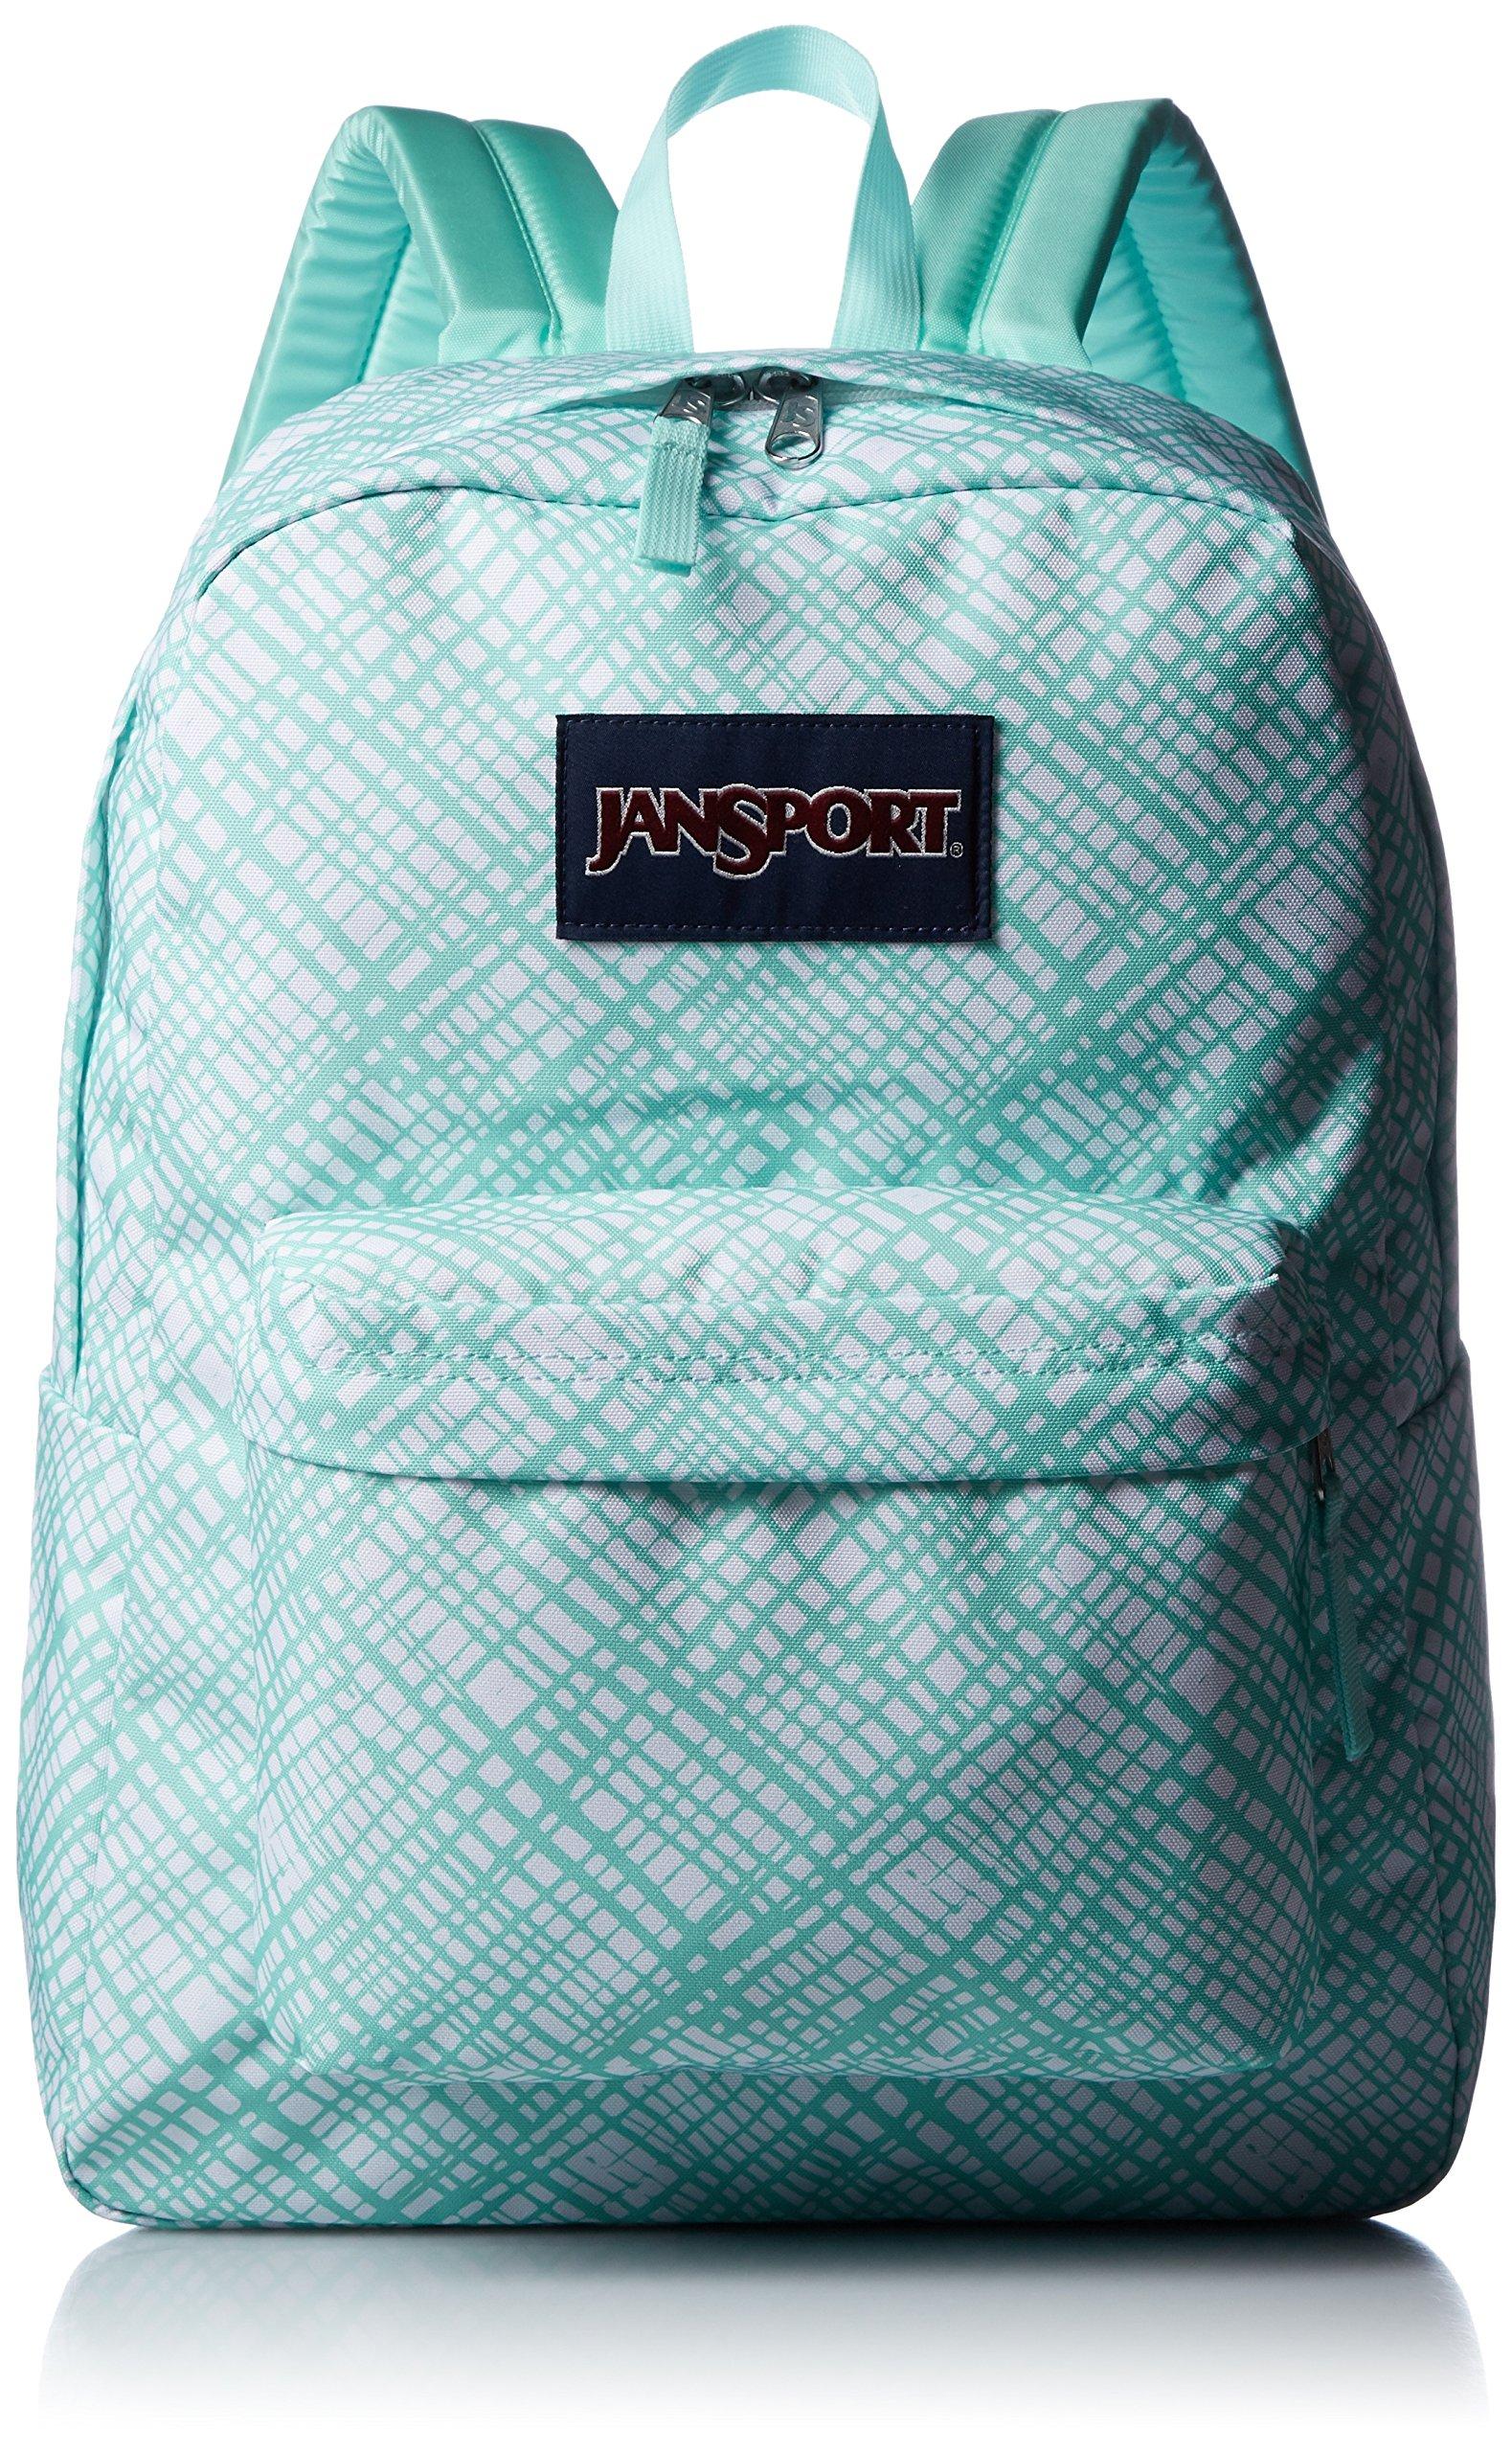 JanSport Womens Classic Mainstream Superbreak Backpack - Aqua Dash Jagged Plaid / 16.7'' H X 13'' W X 8.5'' D by JanSport (Image #1)